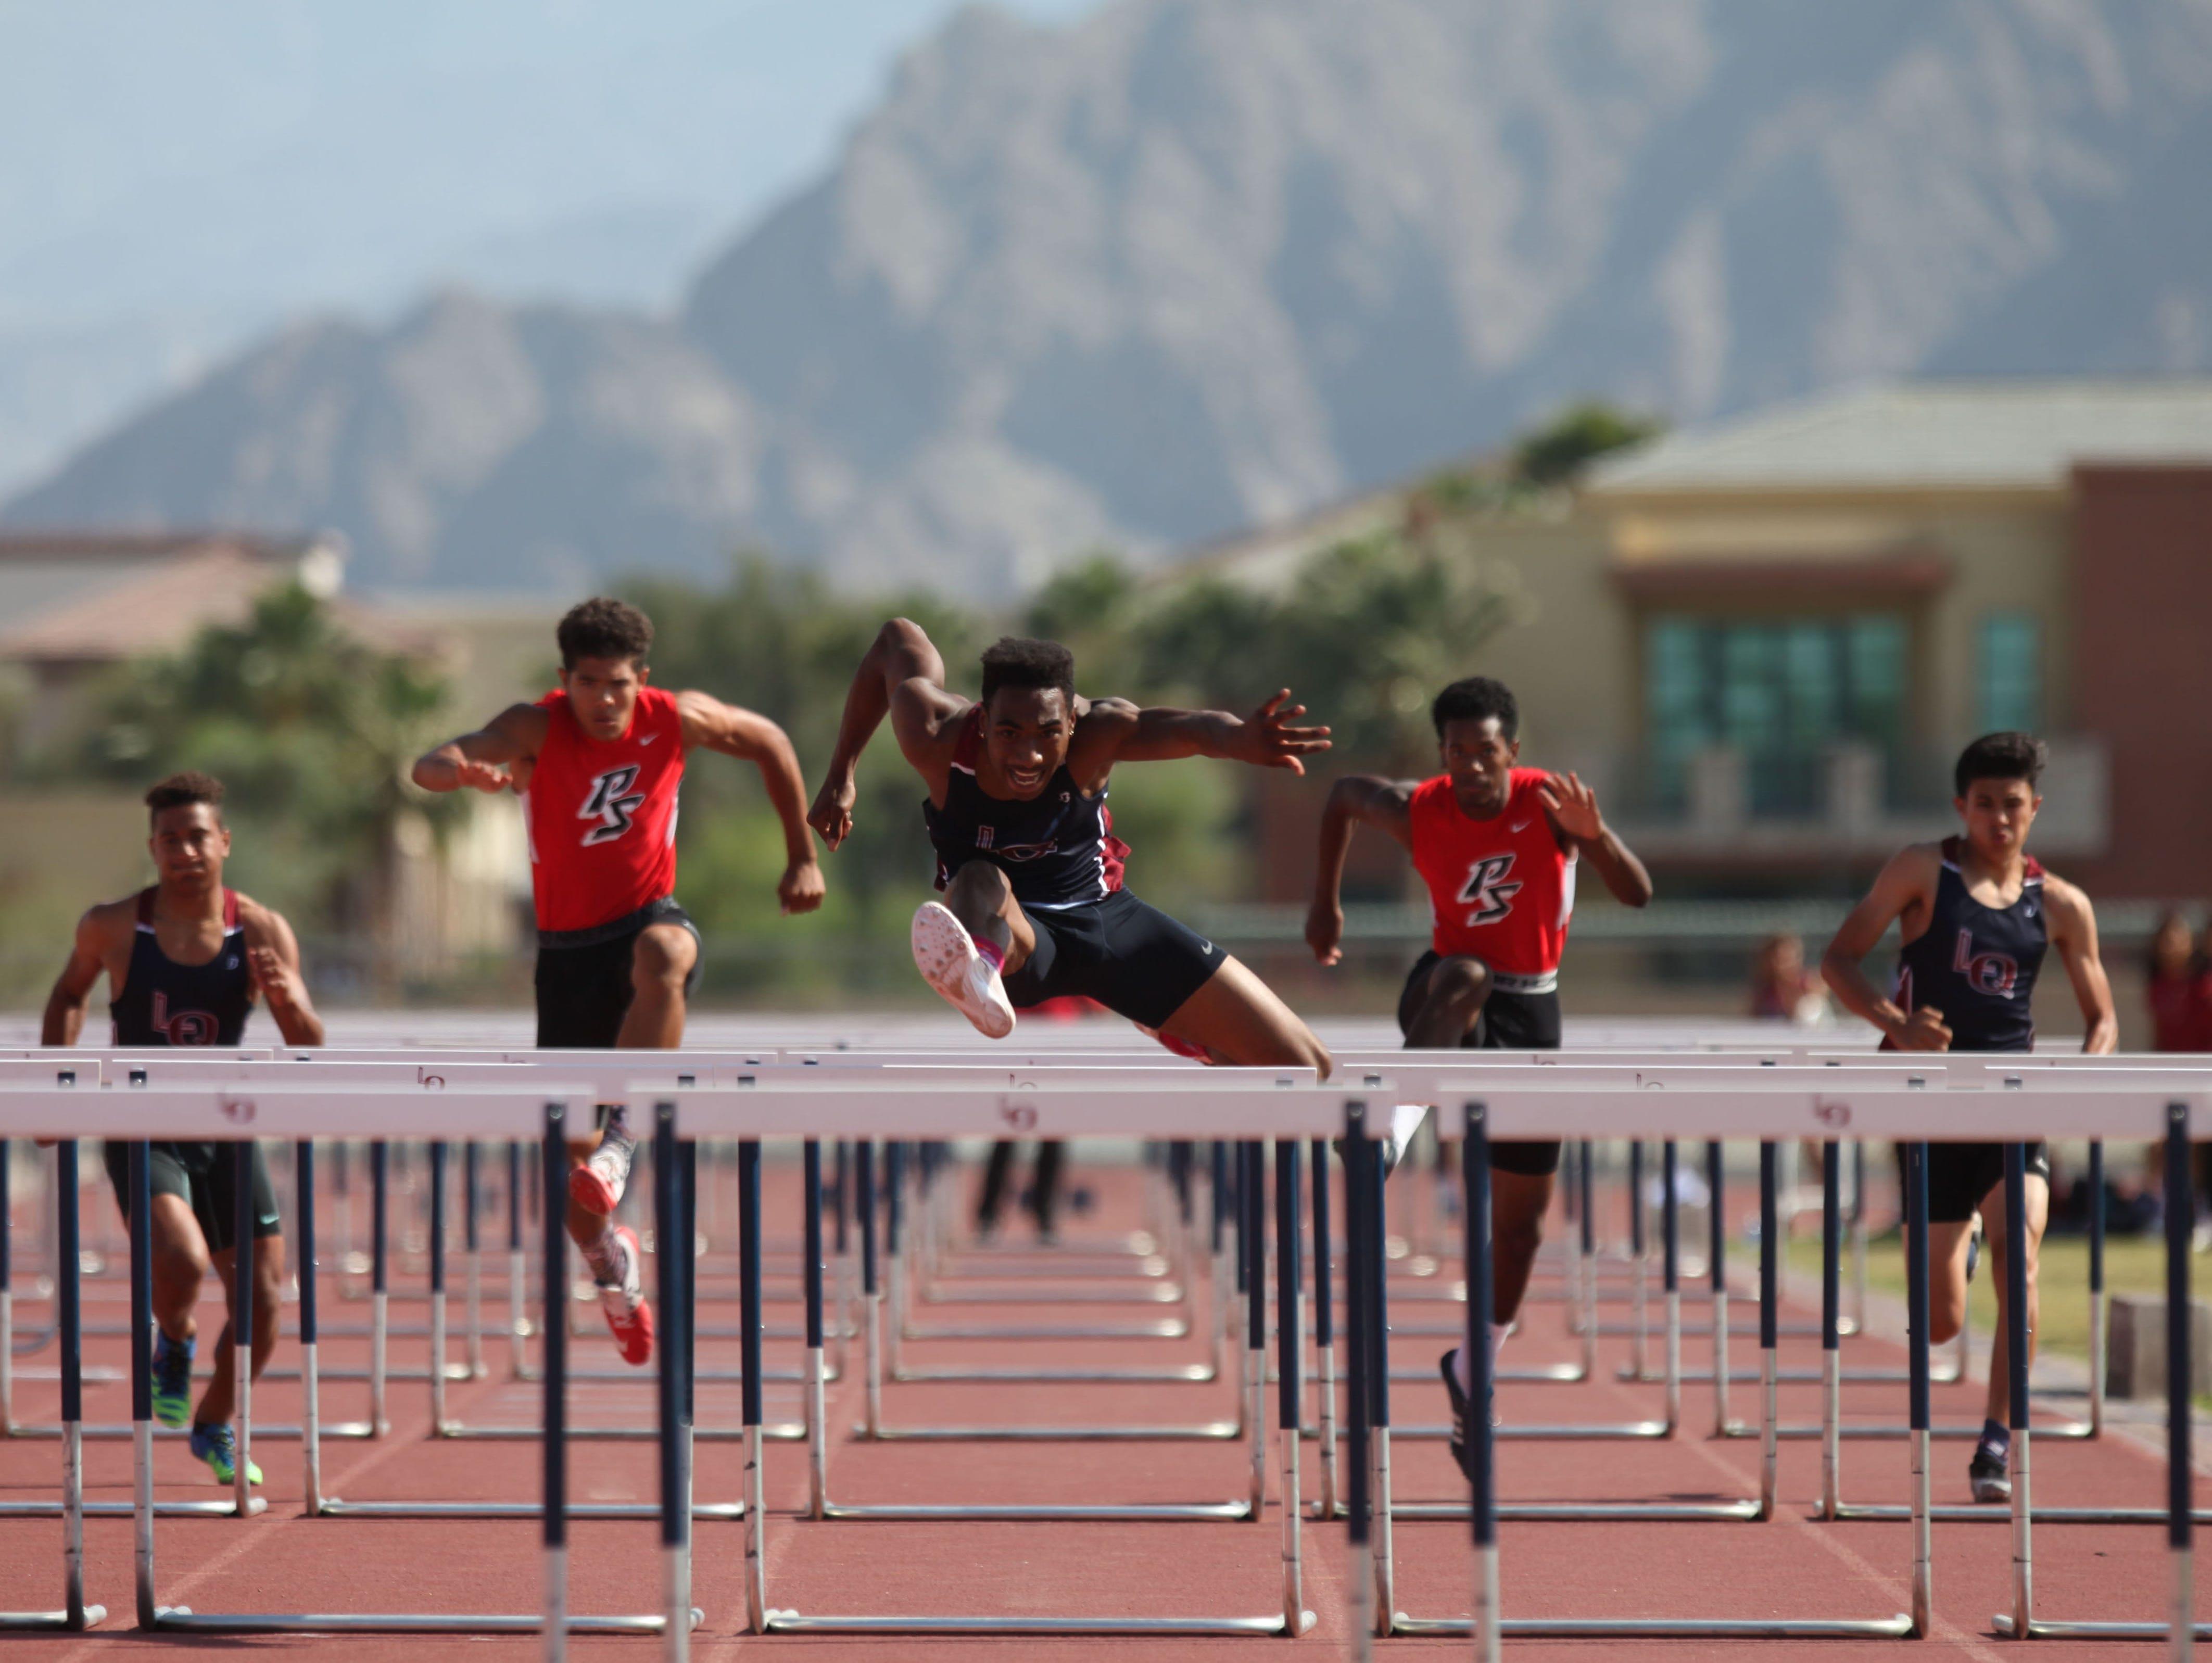 La Quinta High School's Koty Burton easily wins the 100-meter hurdles at La Quinta during his school's meet versus Palm Springs High School.